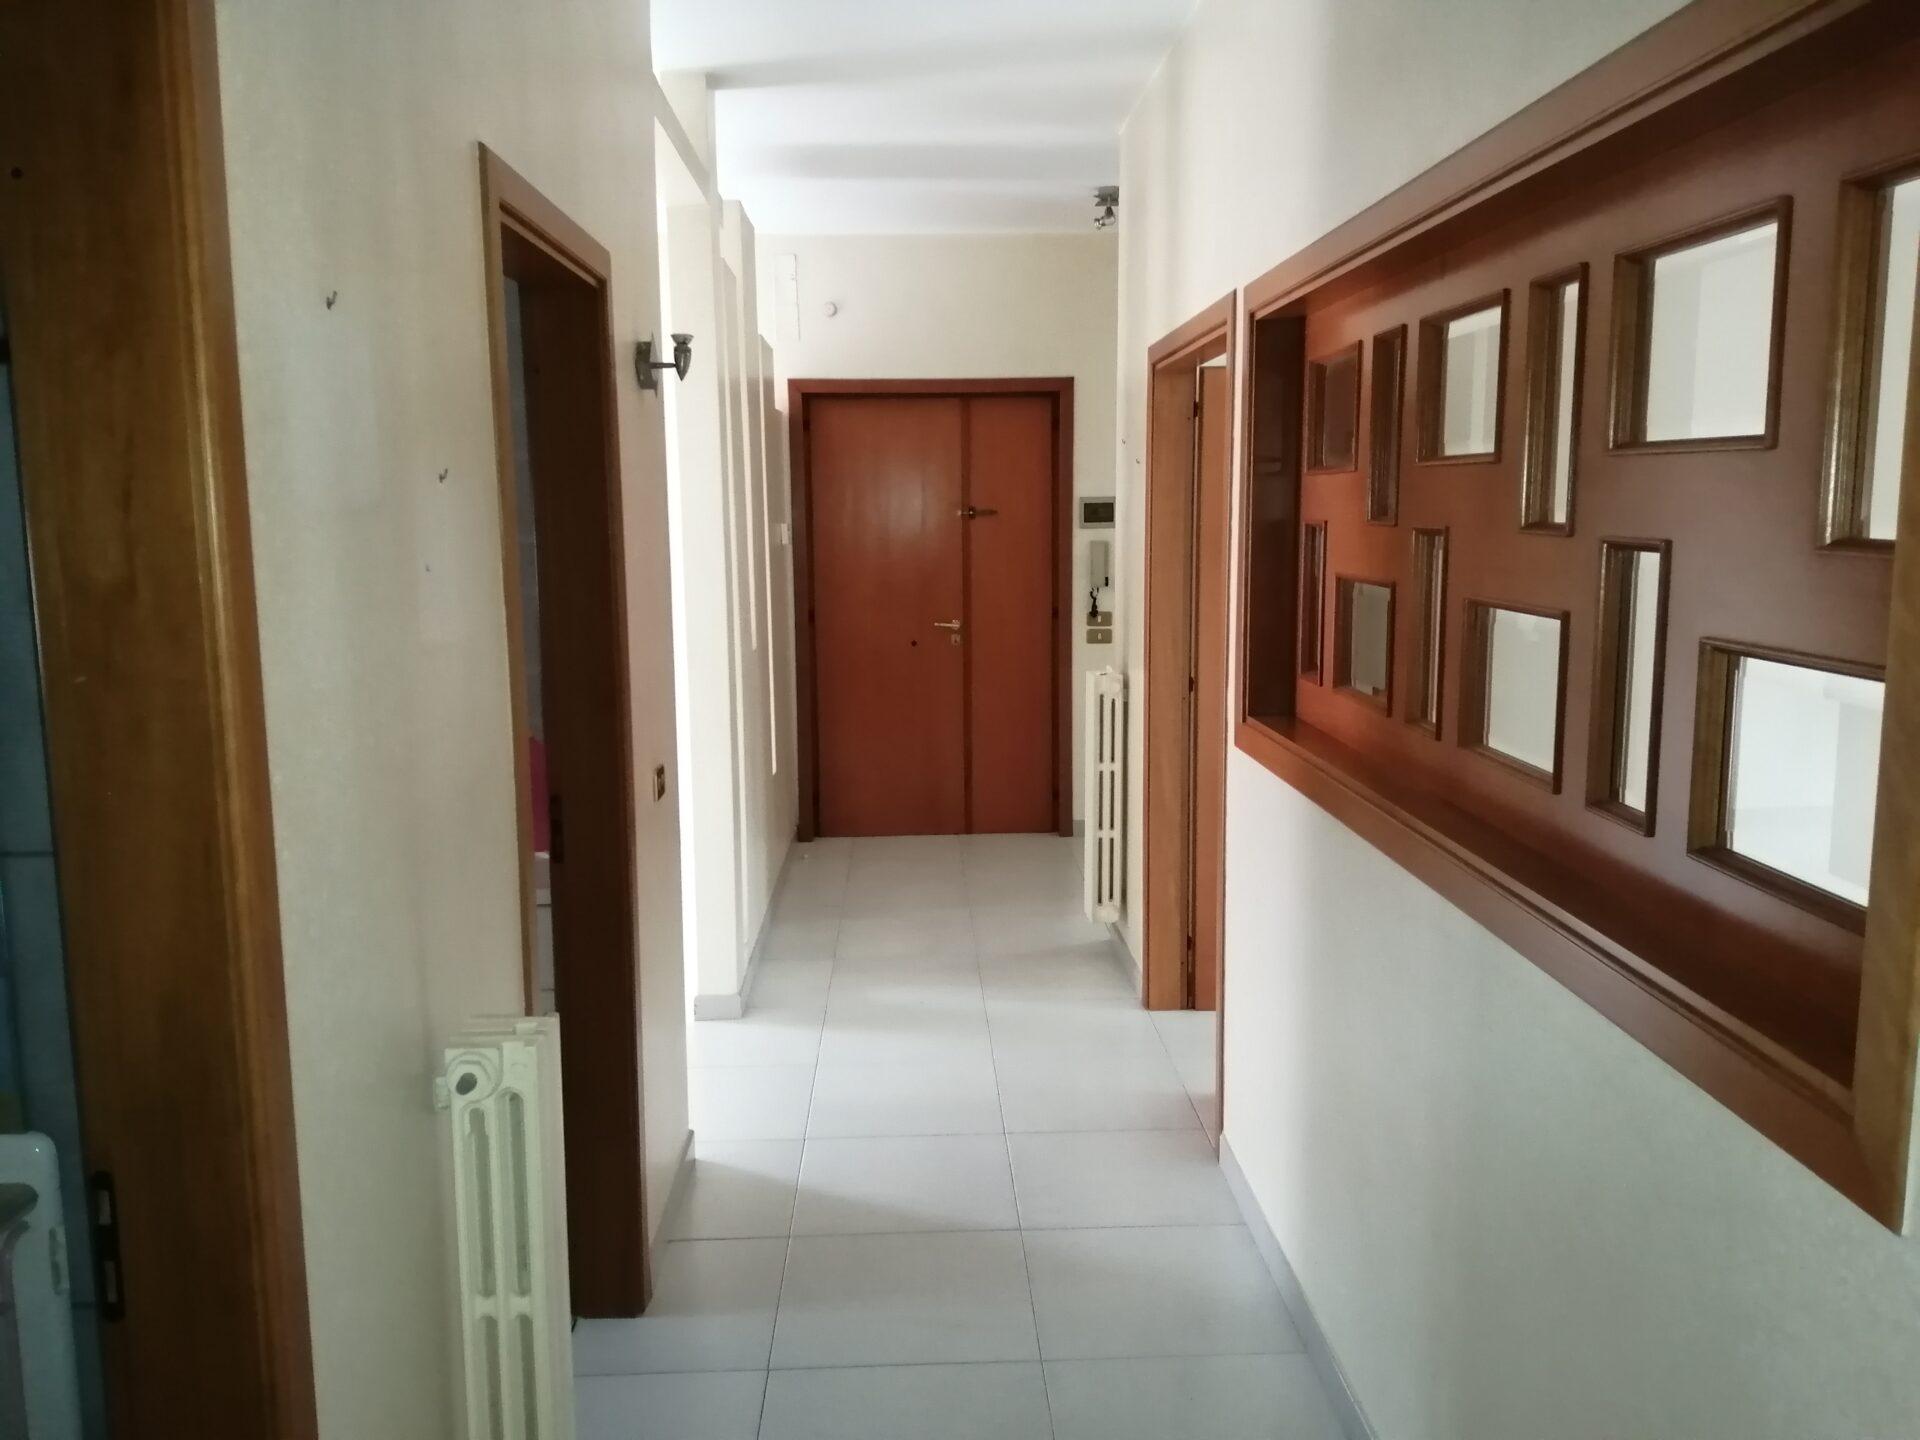 Appartamento 4 vani + acc con 2 Wc – Via S.ELia